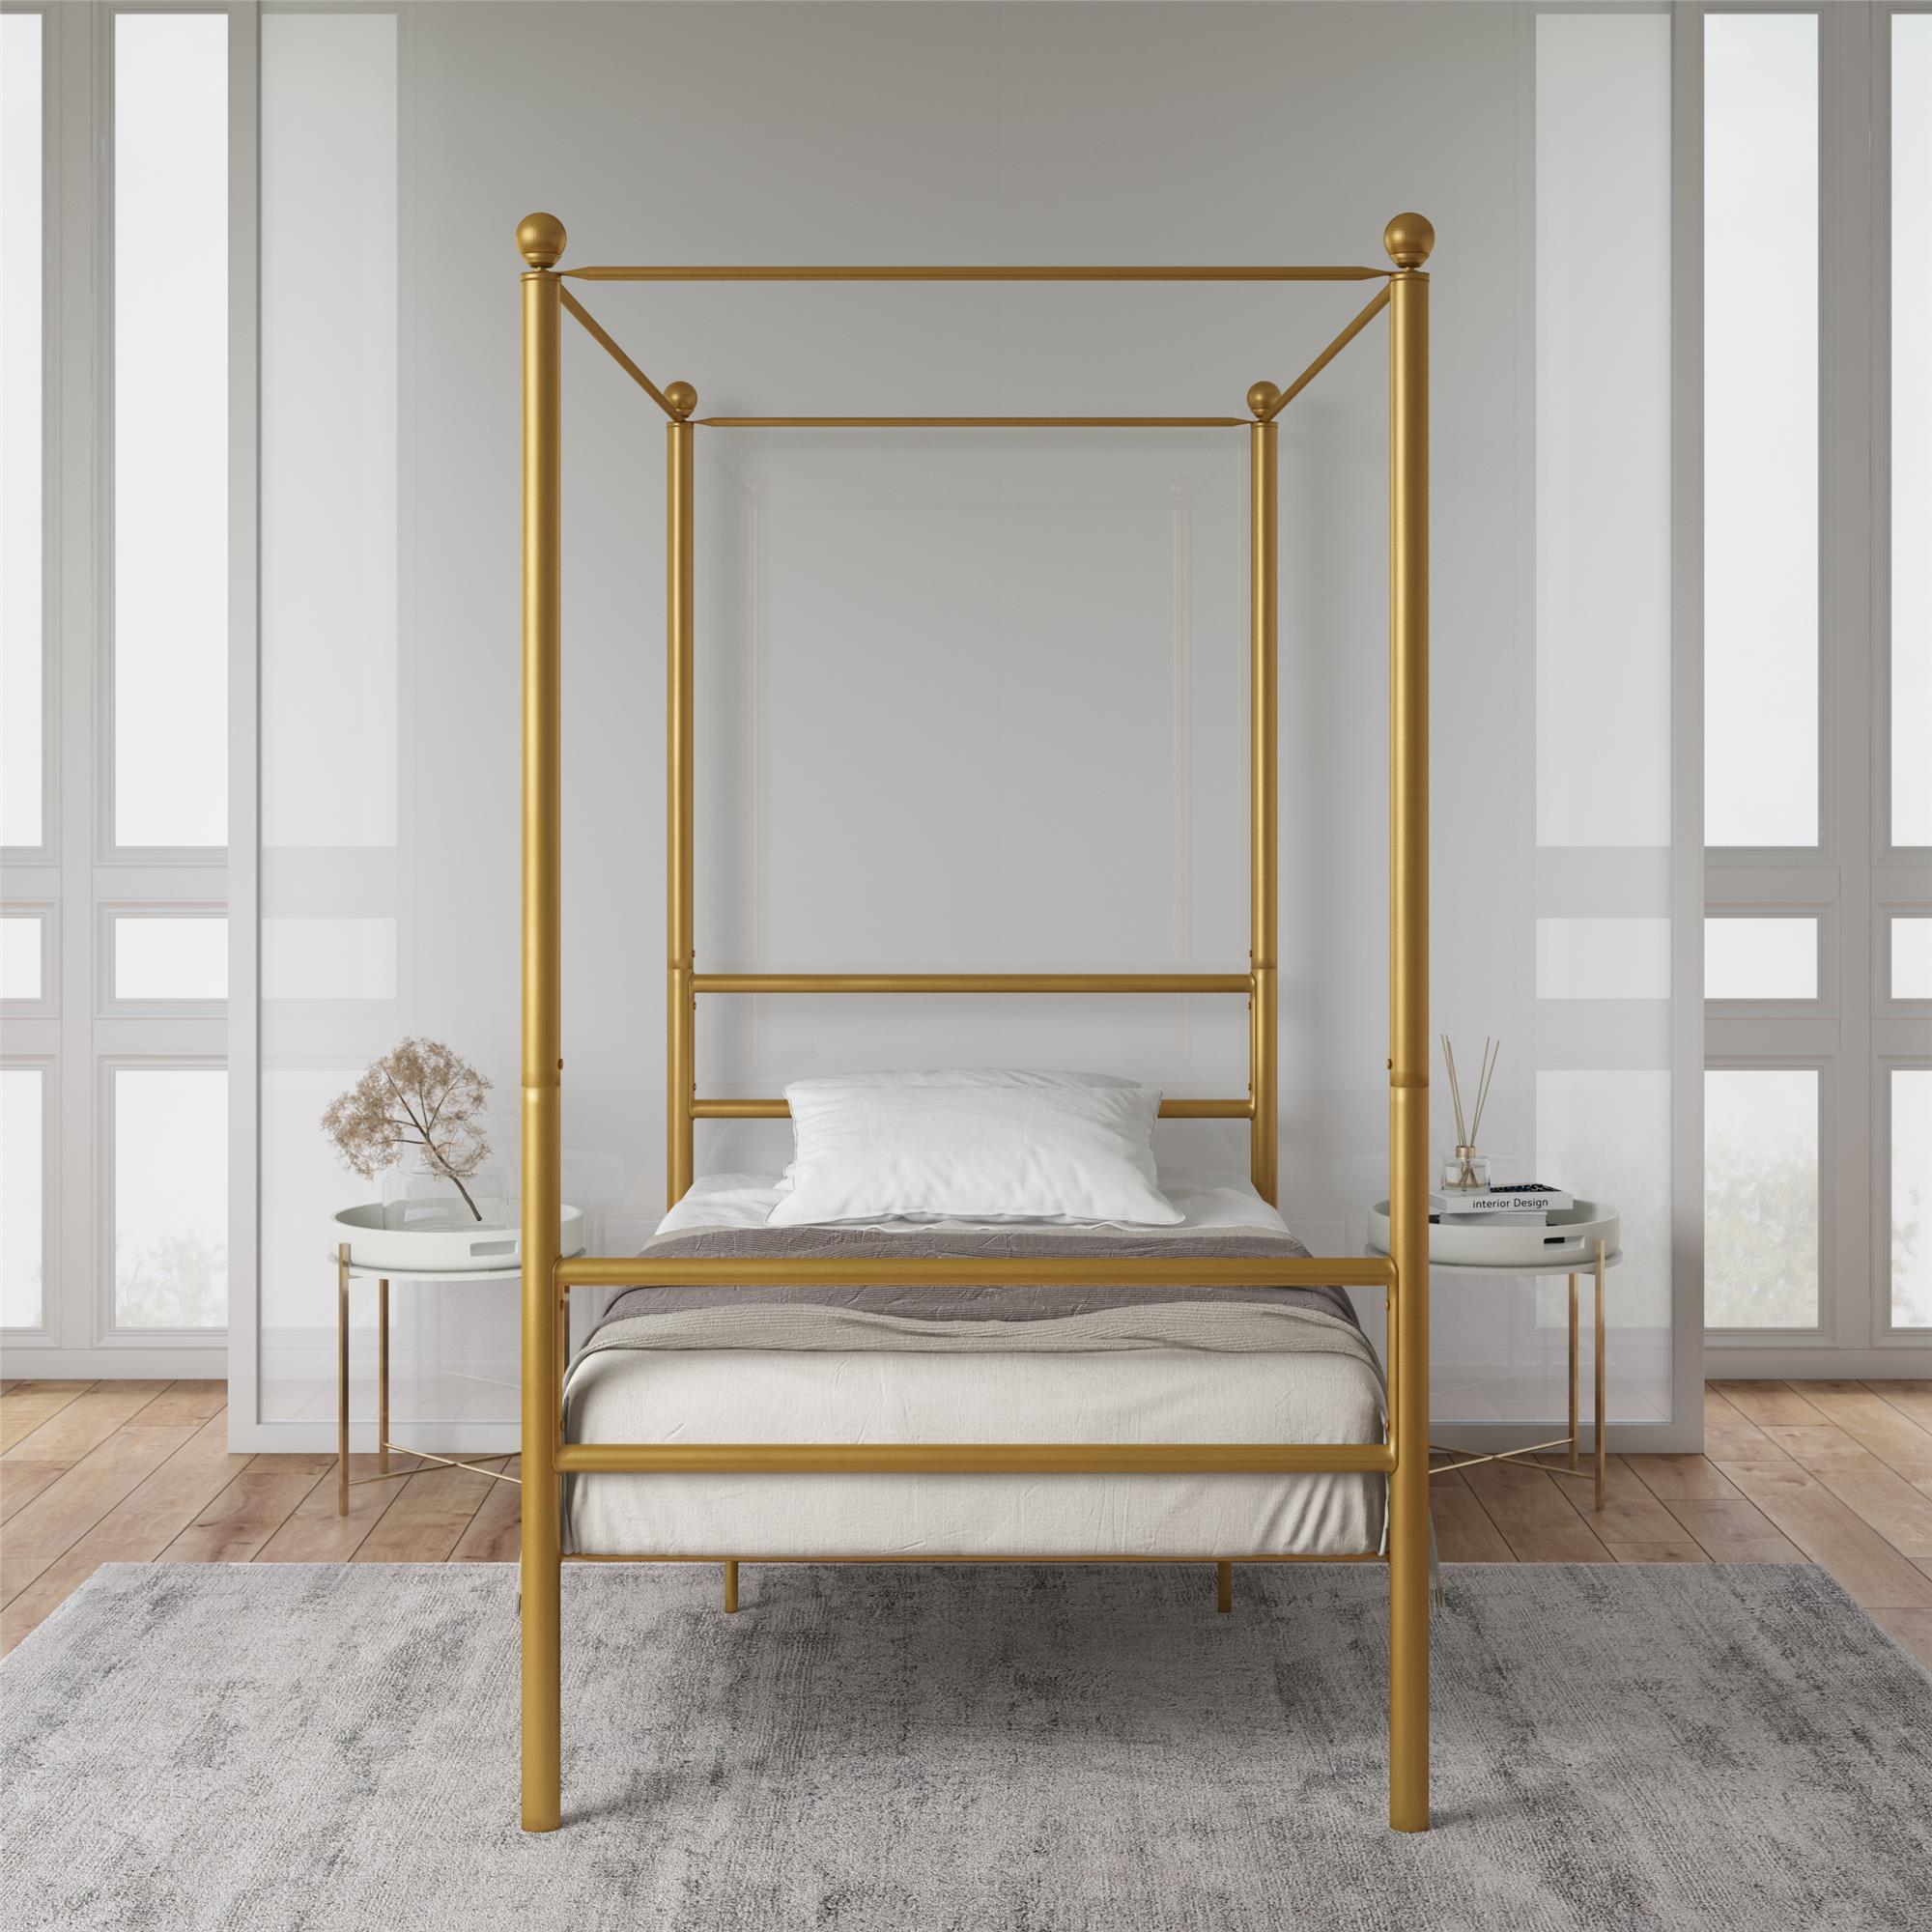 Mainstays Canopy Bed Twin Gold Metal Walmart Com Walmart Com